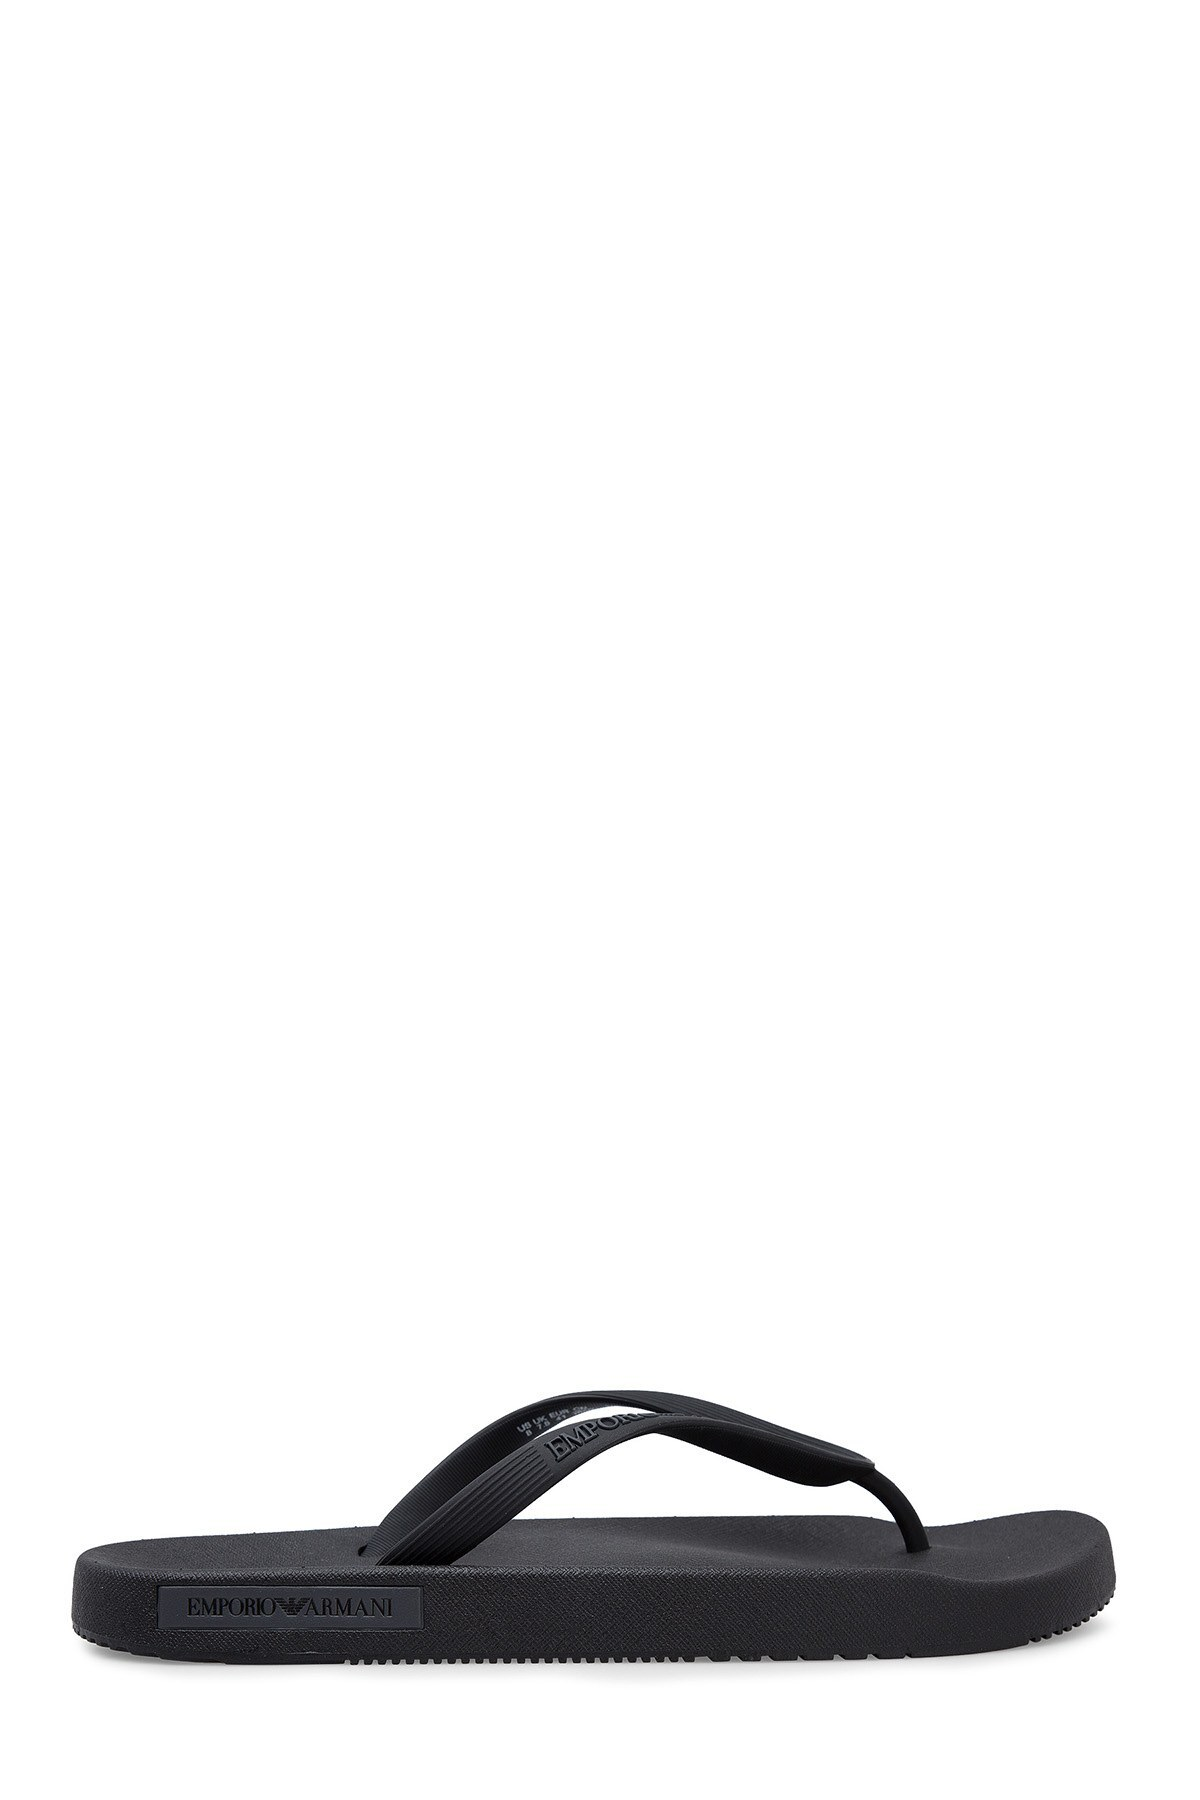 Emporio Armani Erkek Terlik X4QS03 XM290 K001 SİYAH-SİYAH